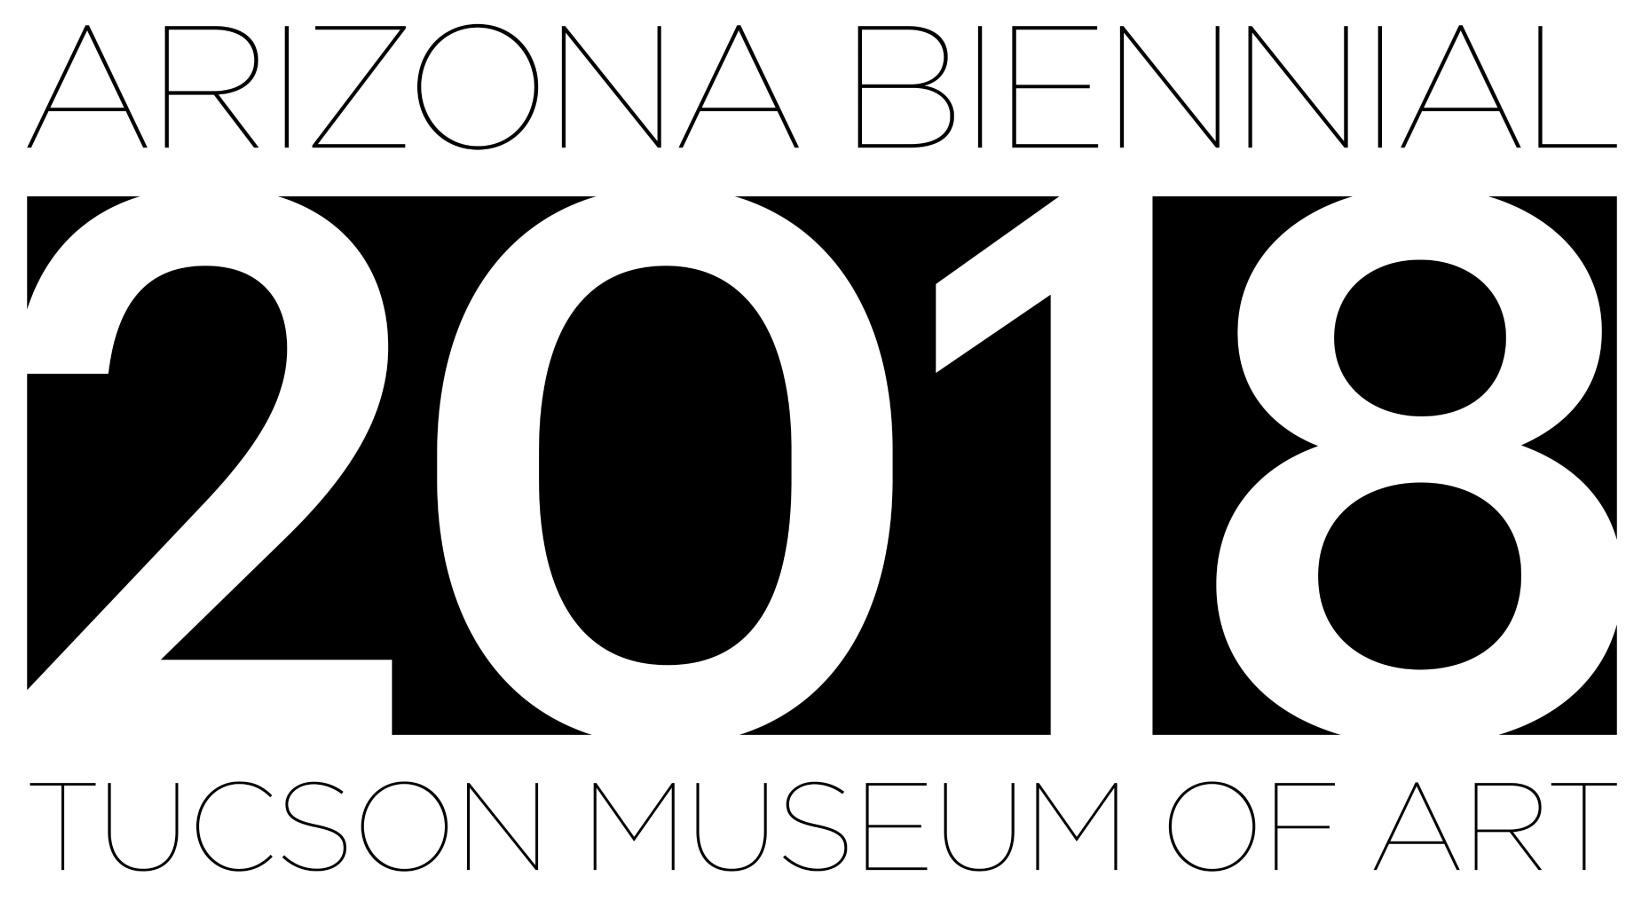 Graphic for the Arizona Biennial 2018.